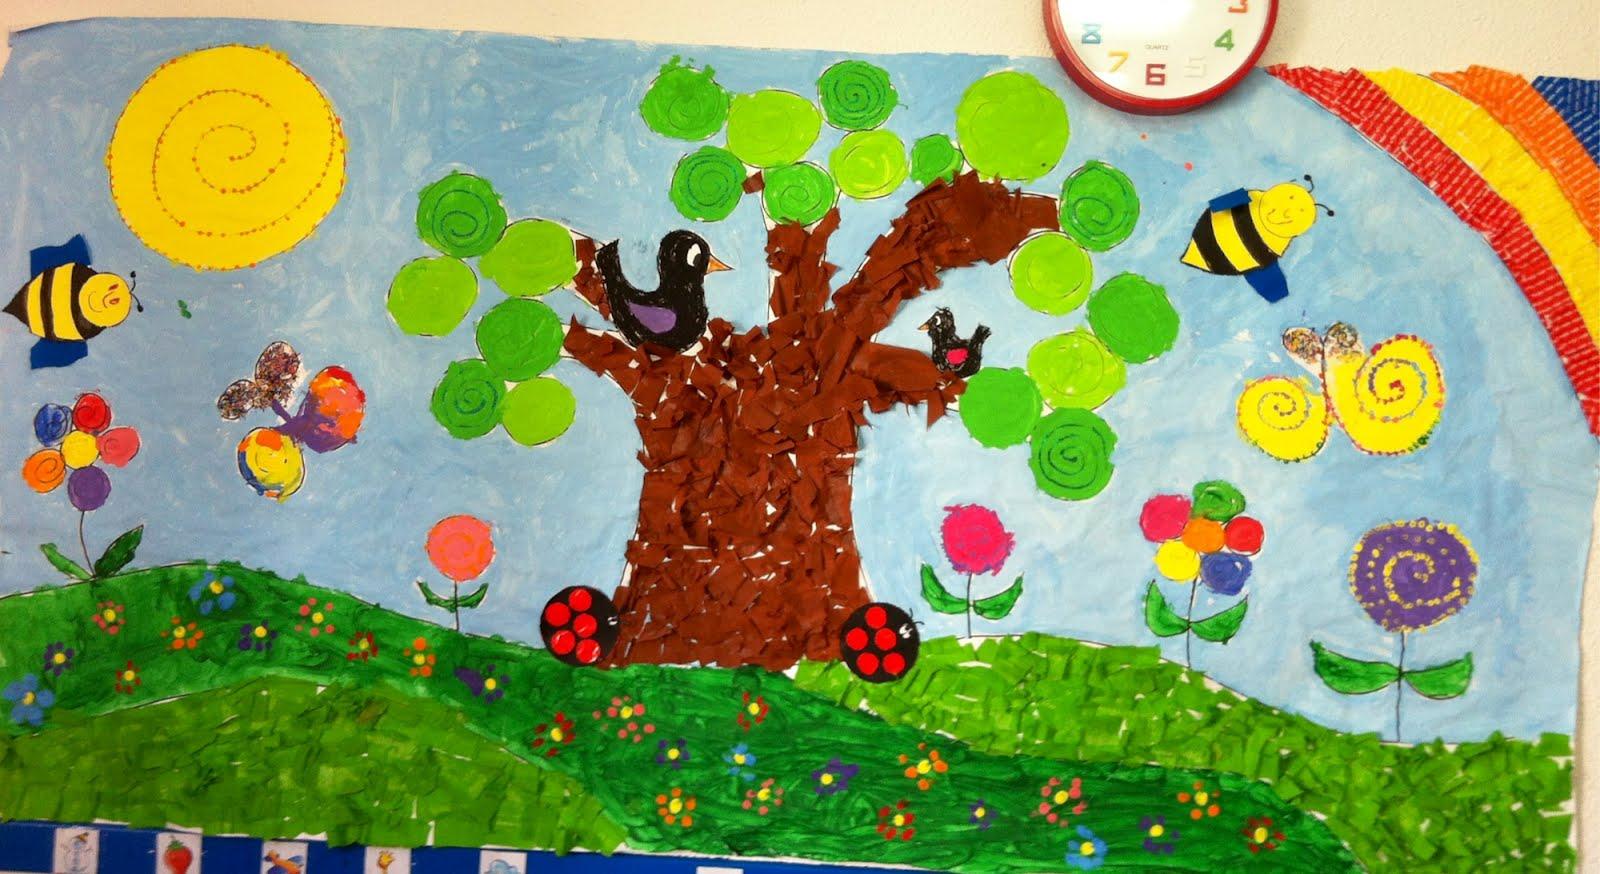 Murales primavera 4 imagenes educativas - Murales con fotos ...